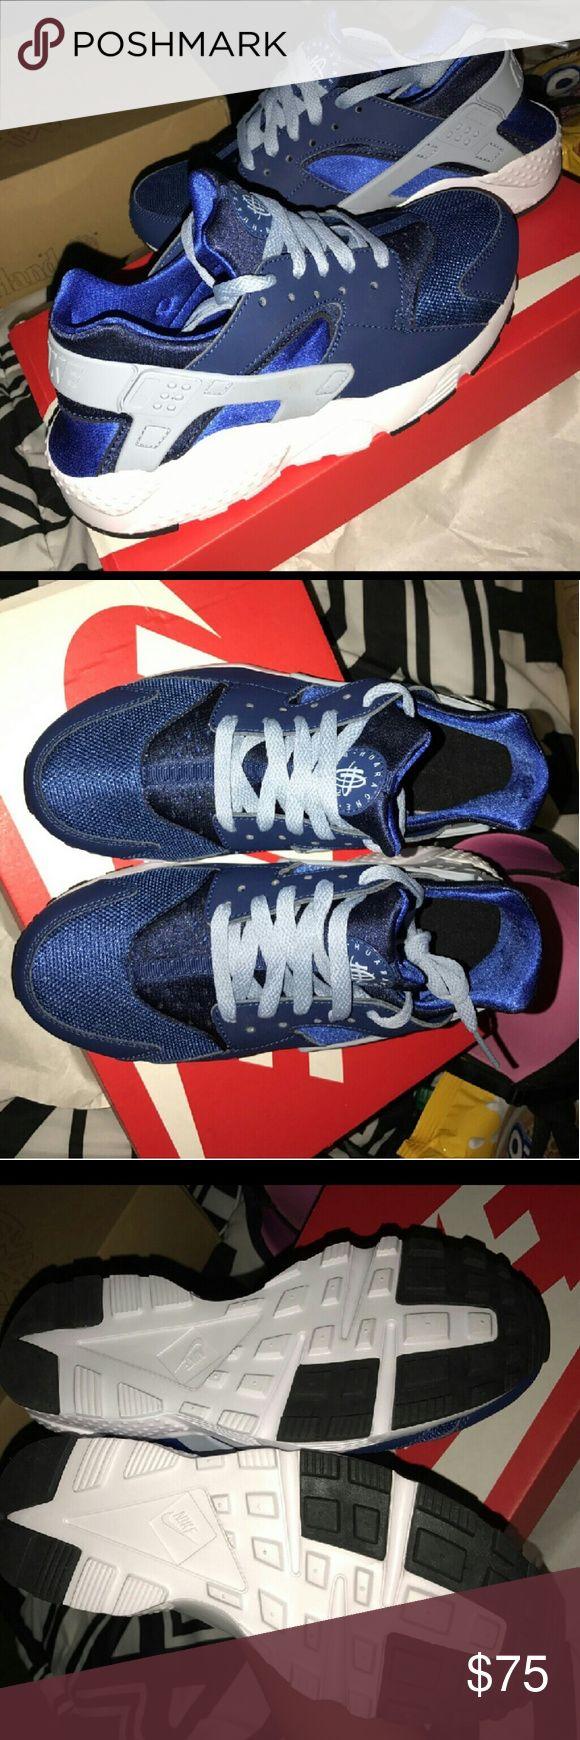 Nike Huarache Run Costal blue and grey blue shies Nike Shoes Athletic Shoes